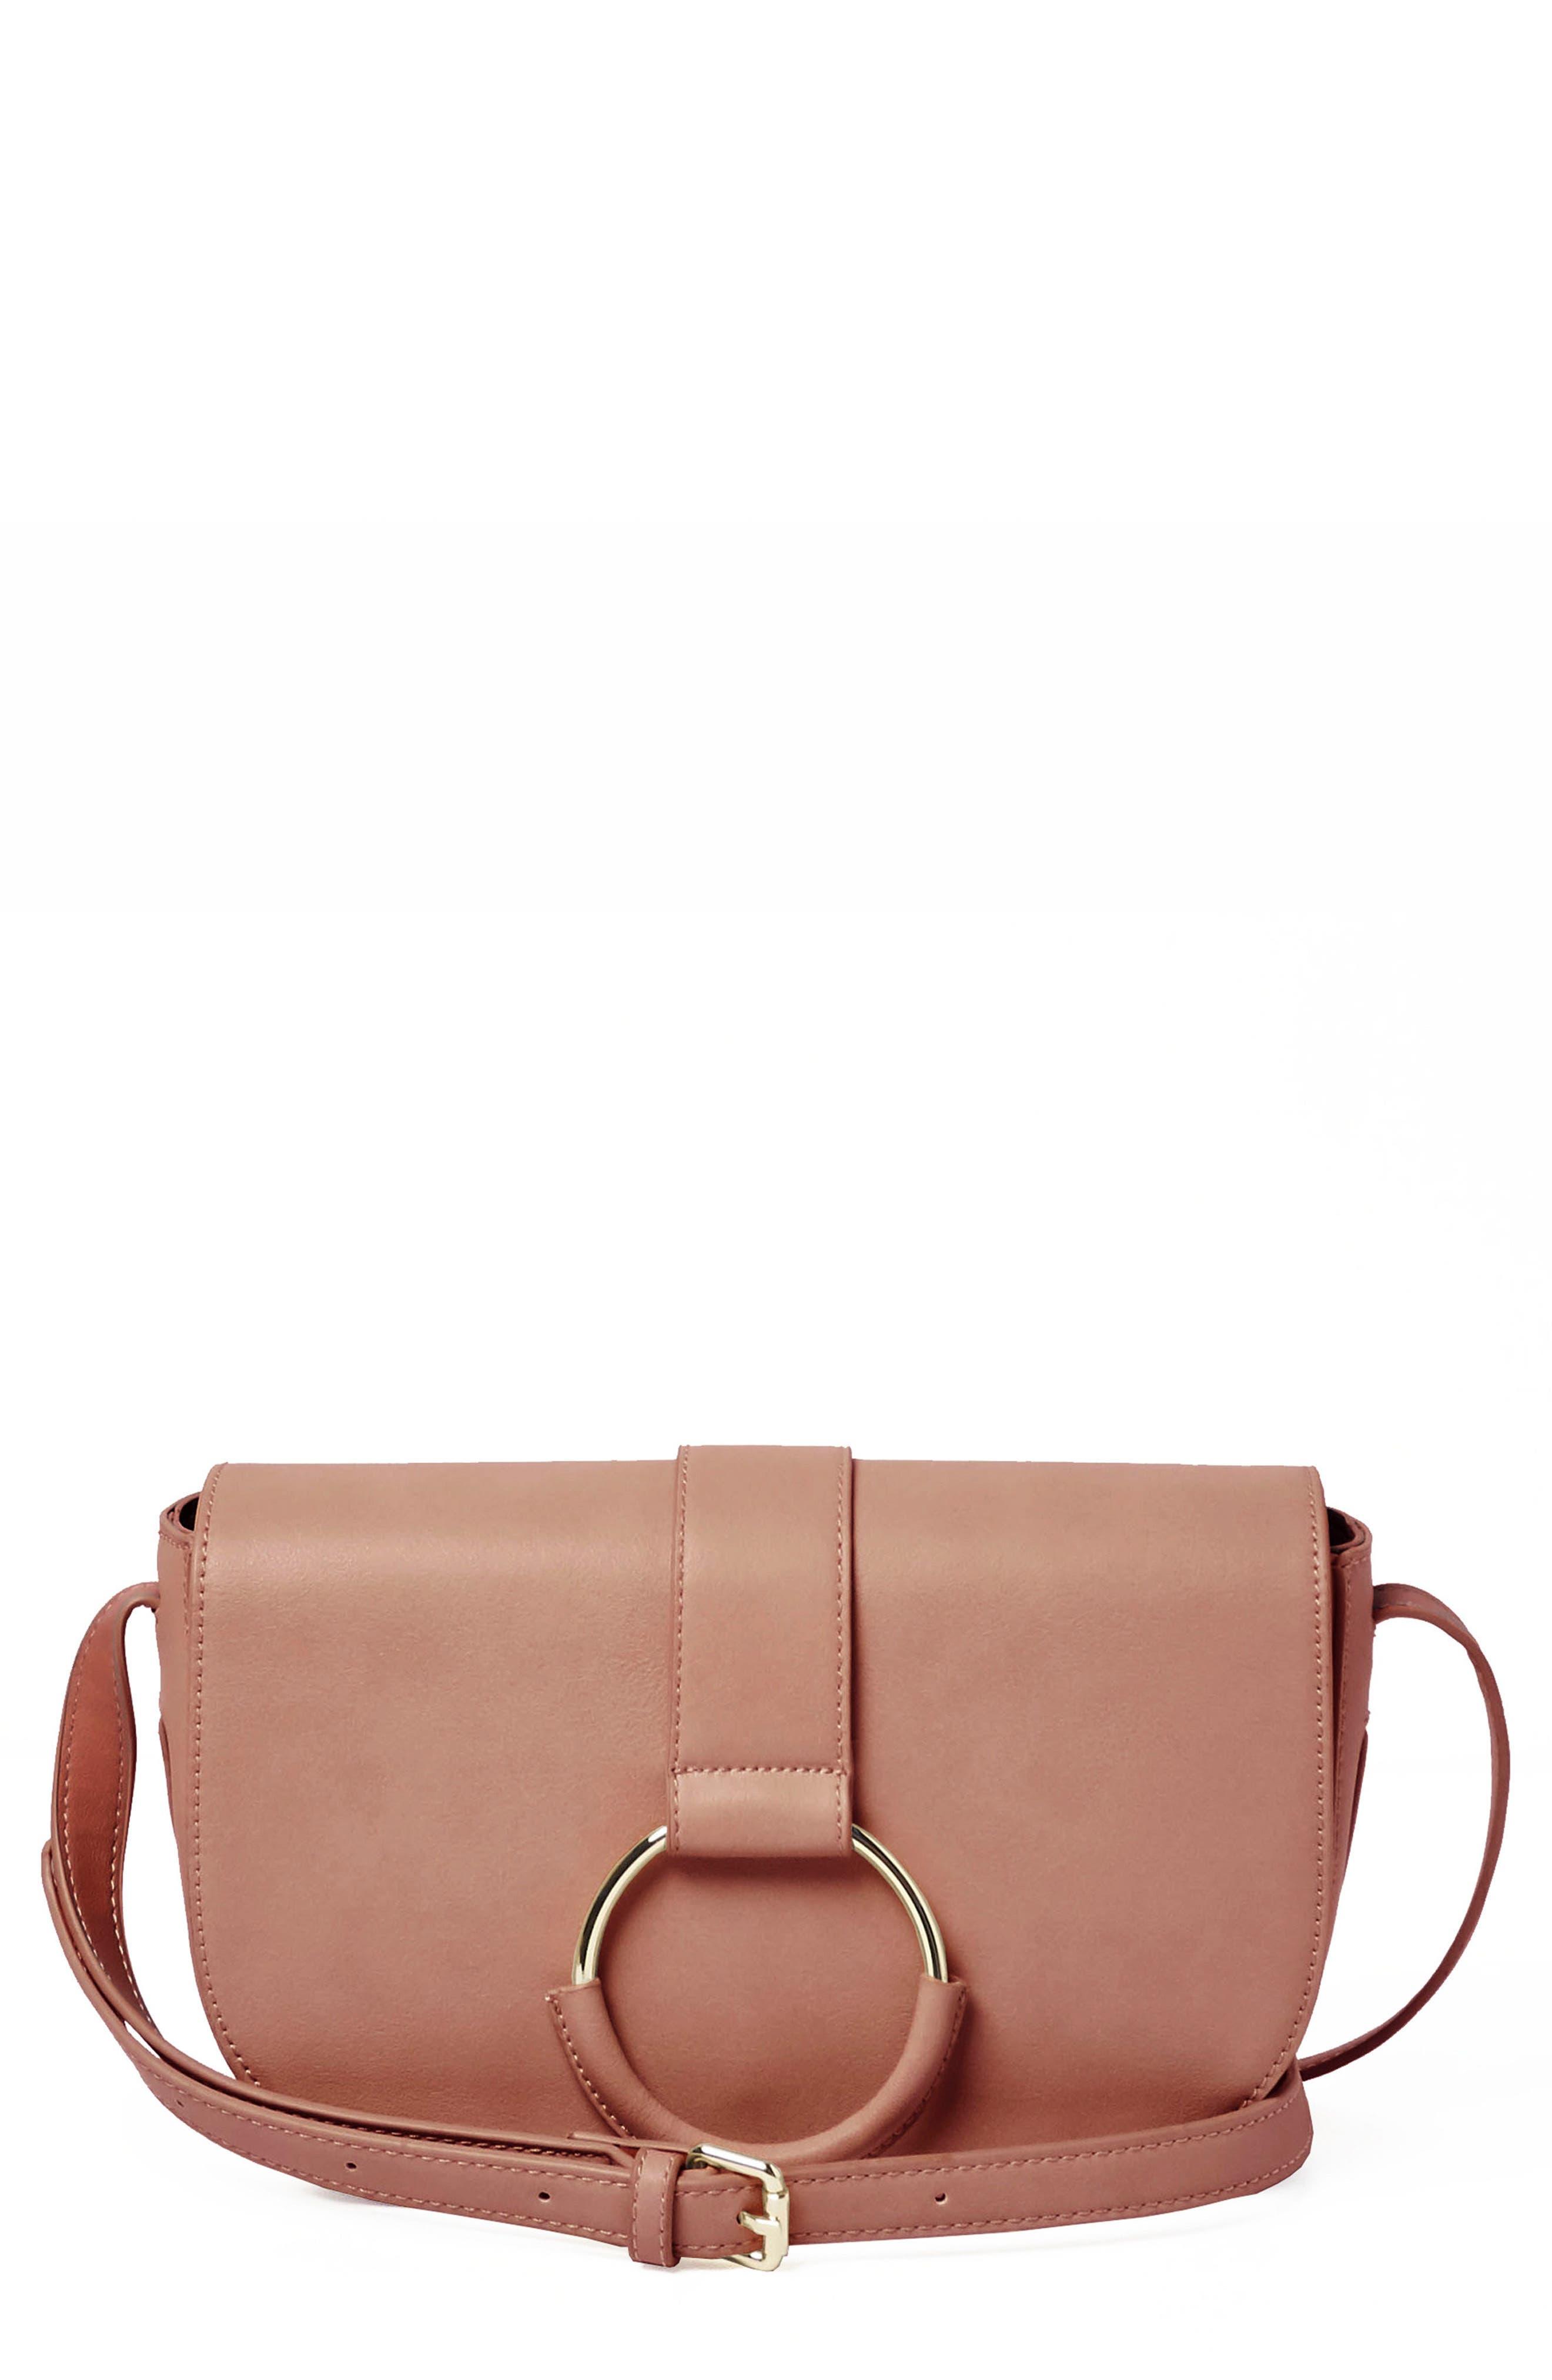 Lolita Vegan Leather Crossbody Bag,                             Main thumbnail 1, color,                             Pink